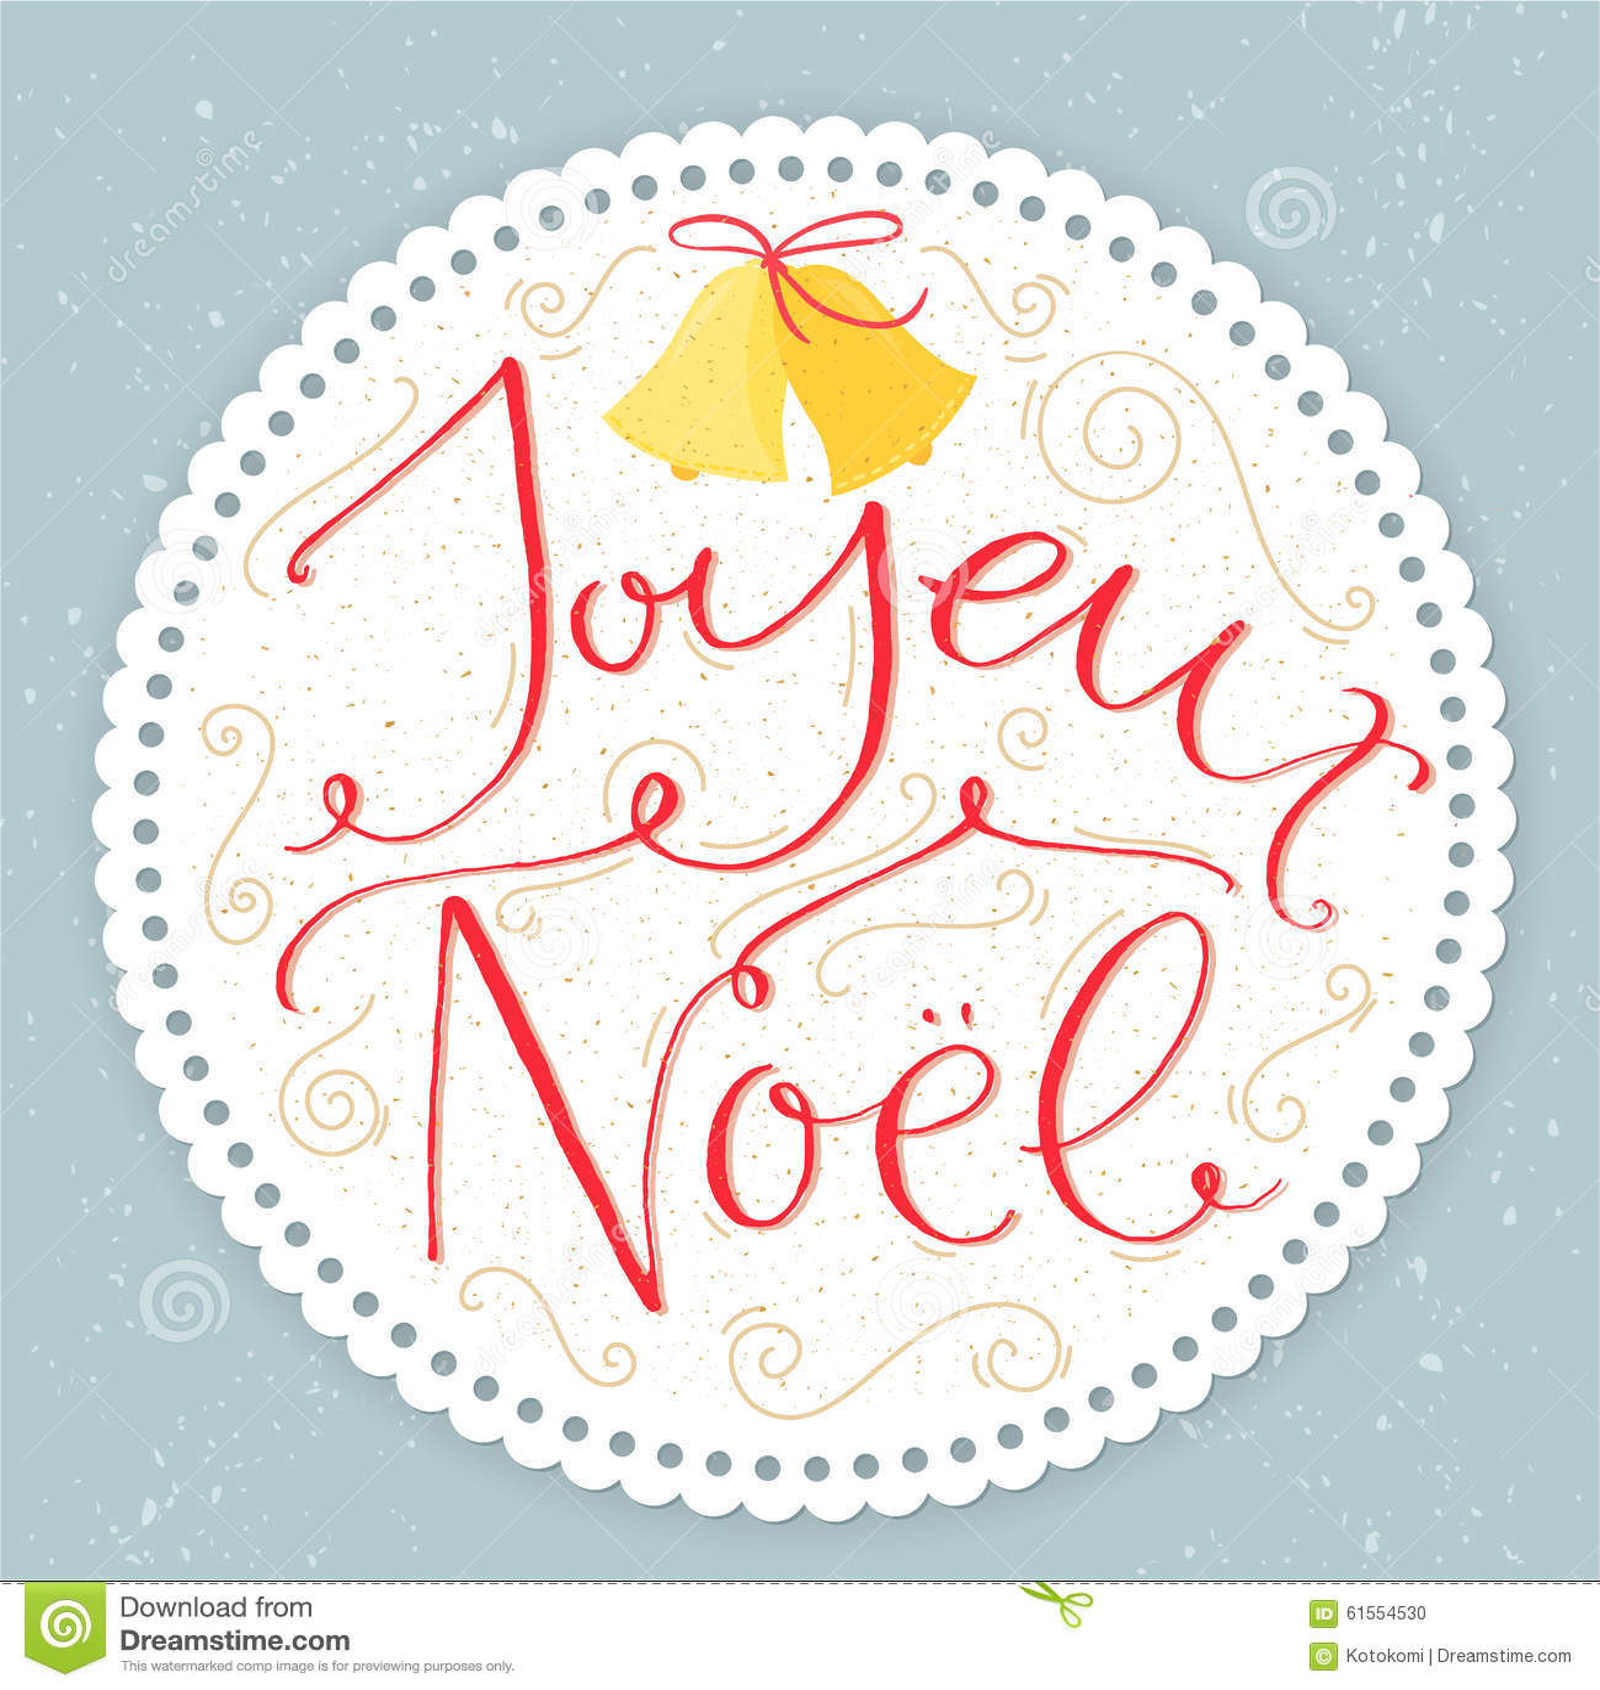 Joyeux Noel A Frase Francesa Significa O Feliz Natal